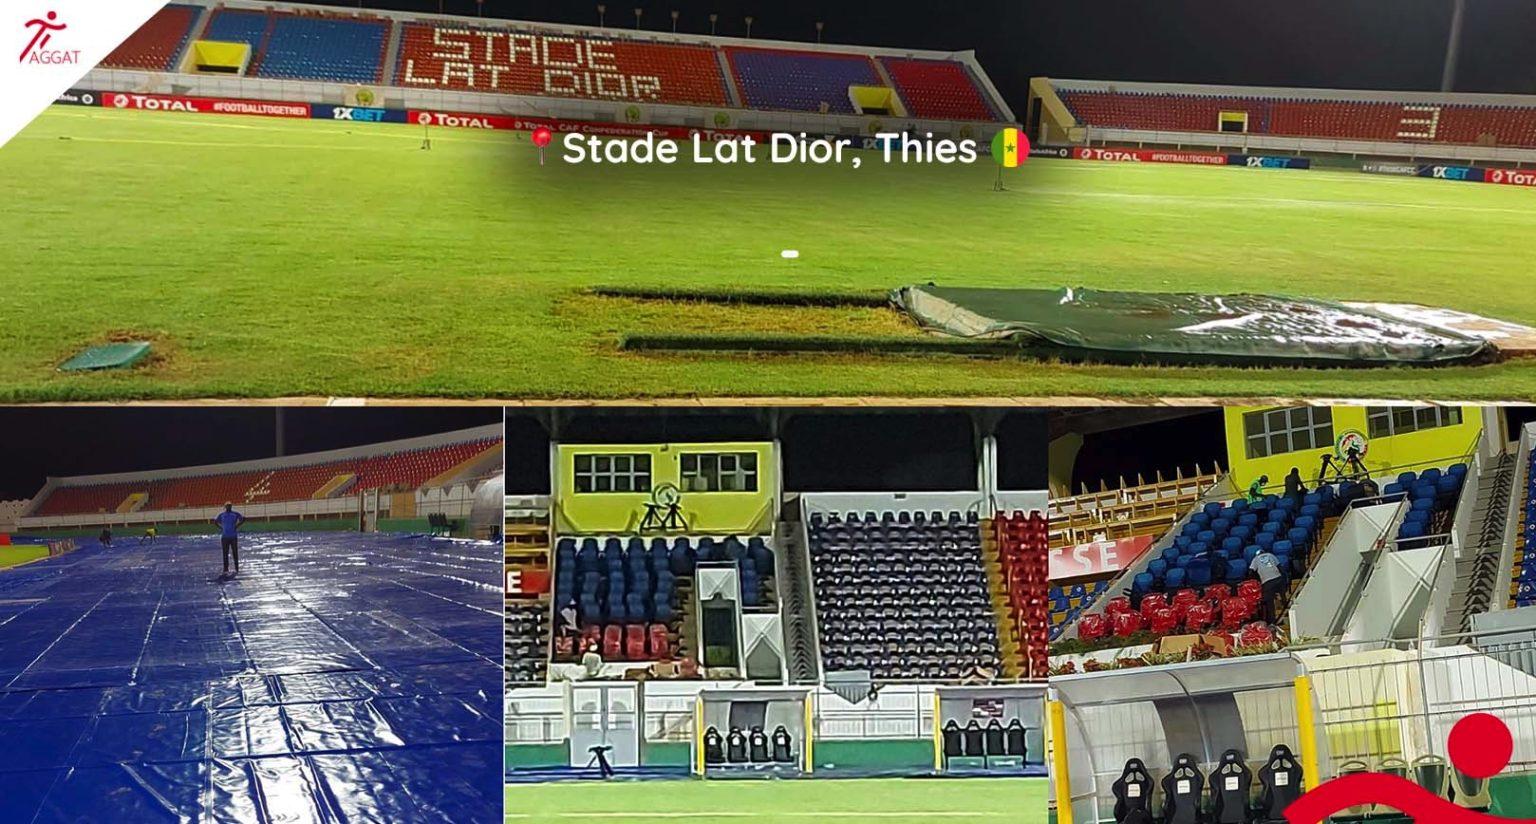 Homologation du Stade Lat Dior de Thiès: La Fédération sénégalaise de football garde espoir